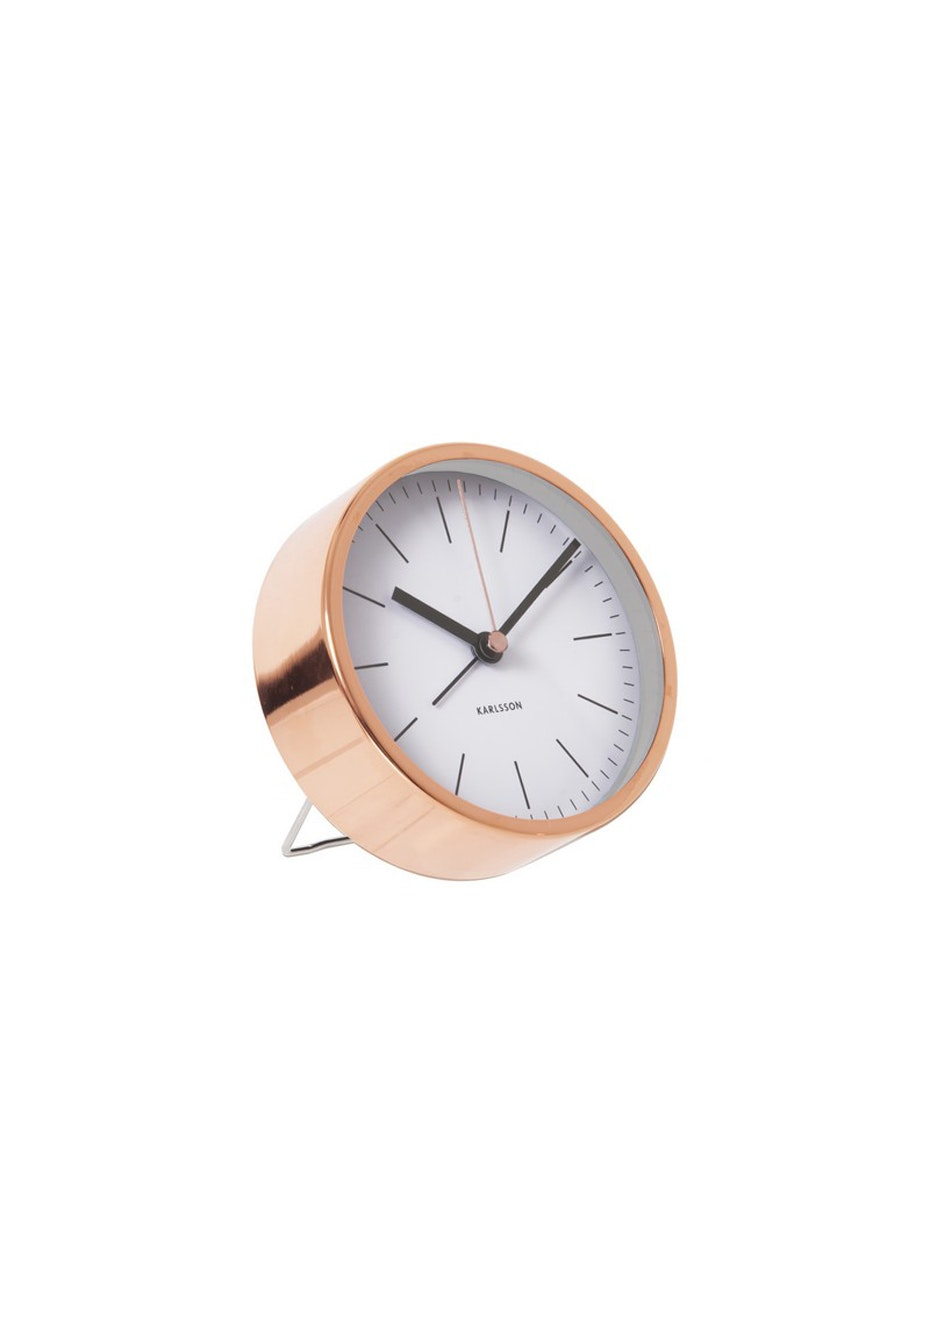 Karlsson - Alarm Clock 'Minimal' - White